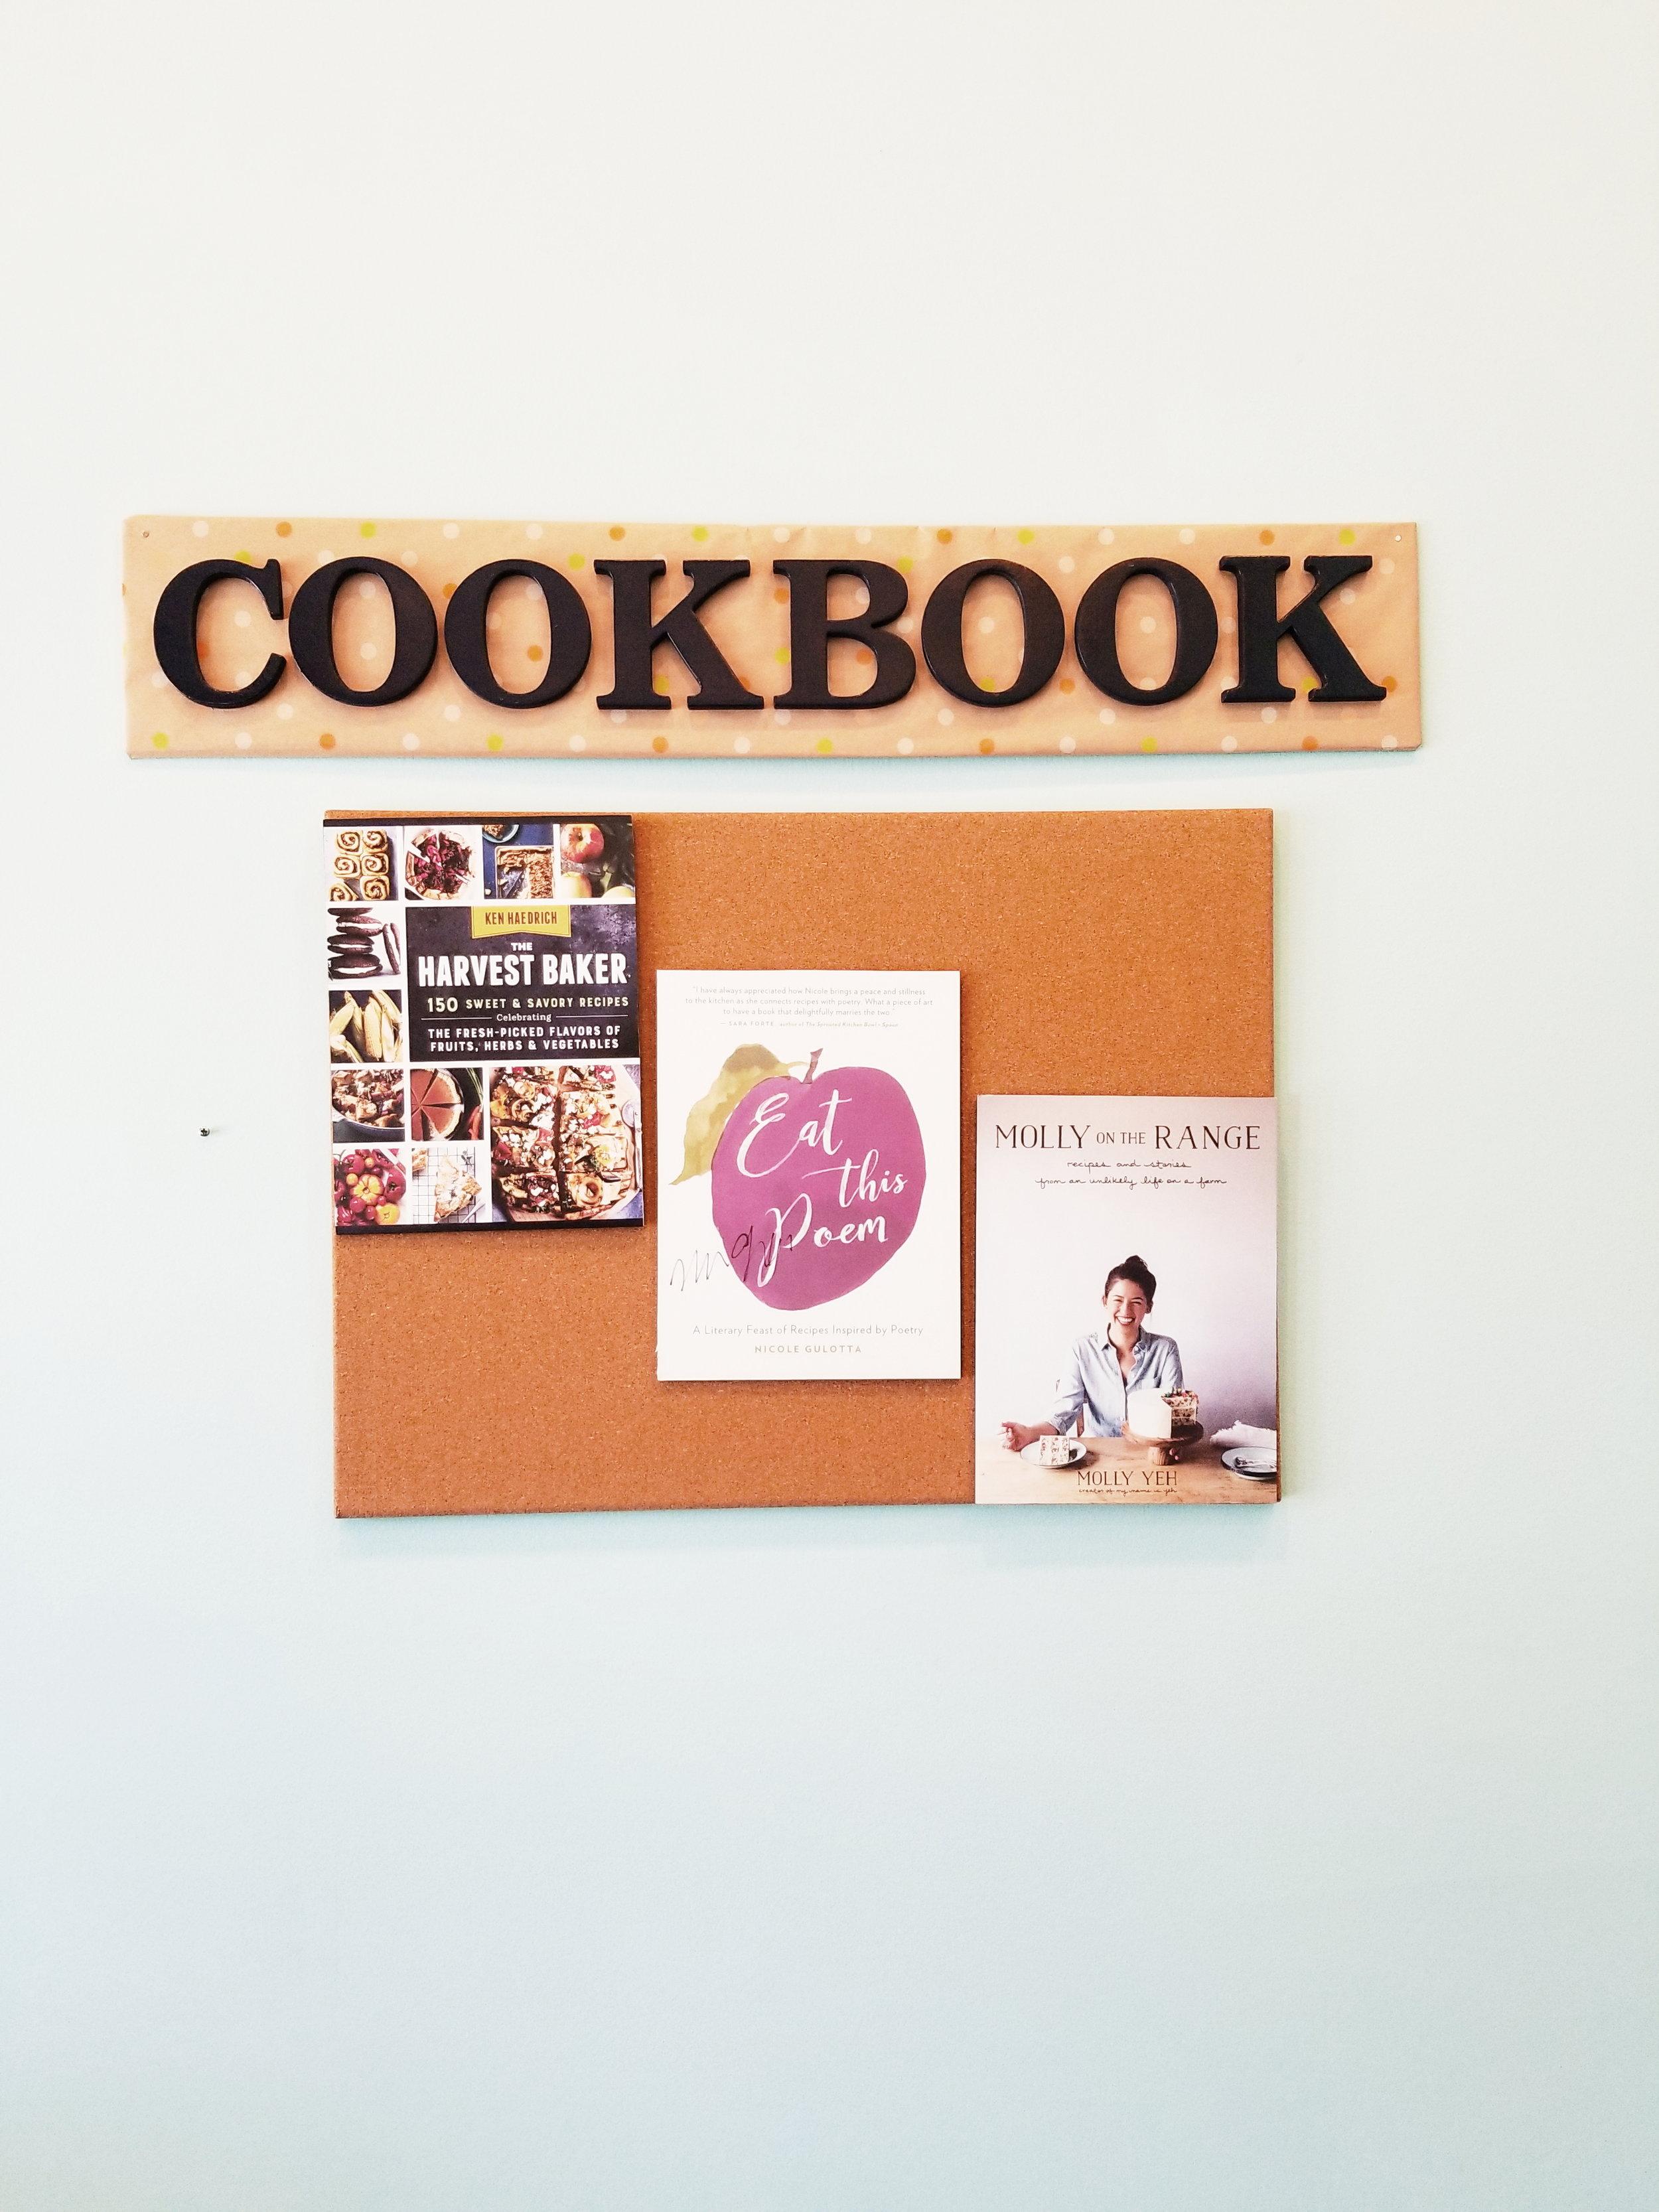 Cookbook covers.jpg